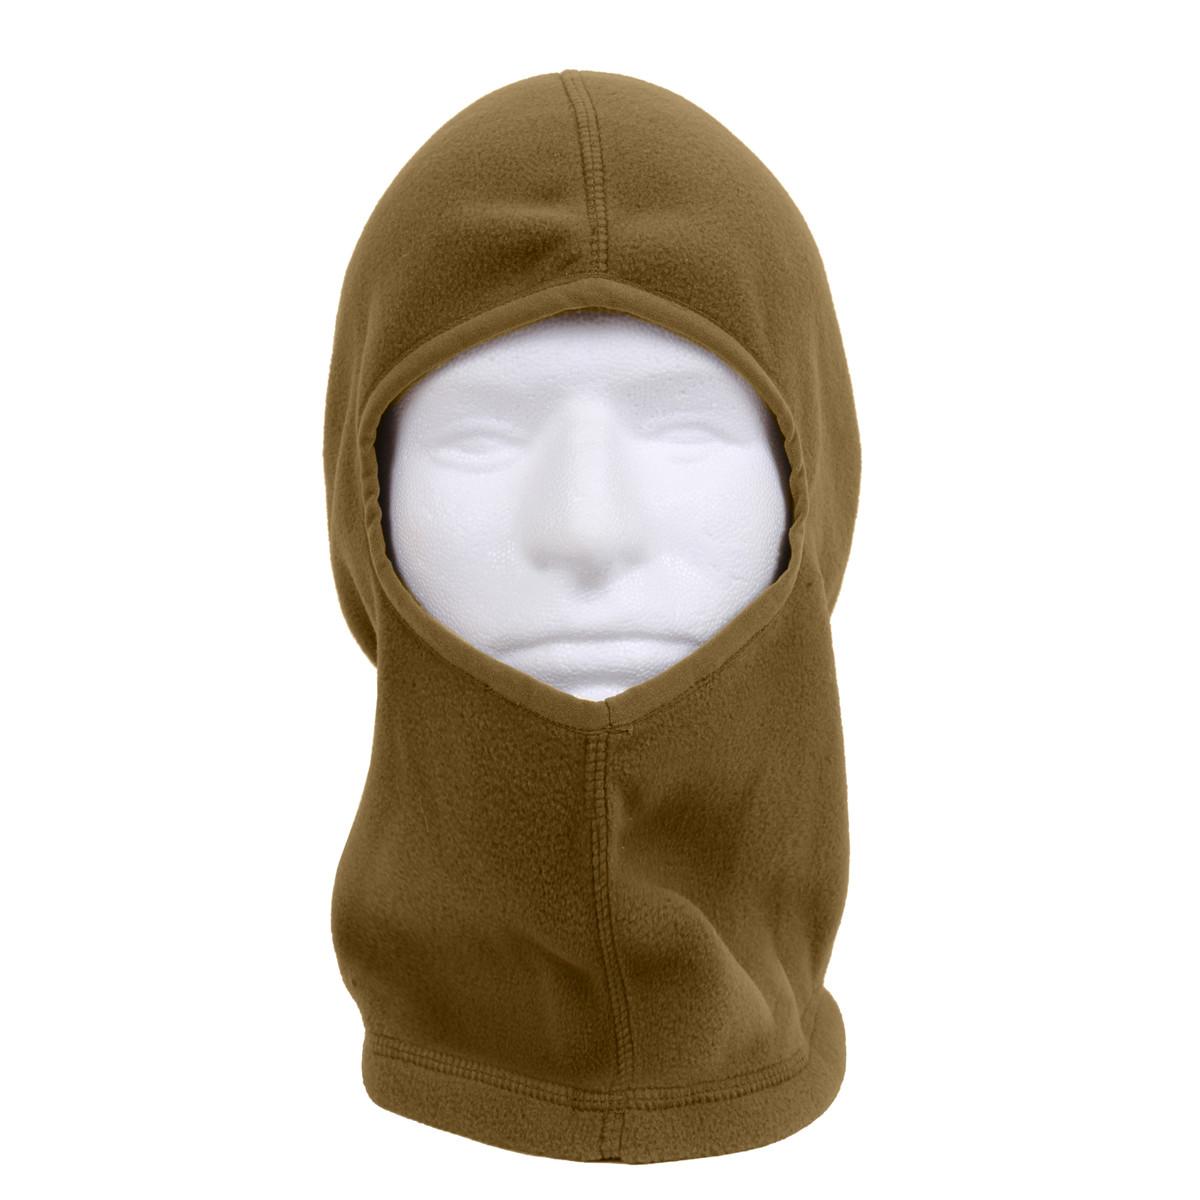 37492d10a1d5e Shop Polar Fleece One Hole Balaclavas - Fatigues Army Navy Gear